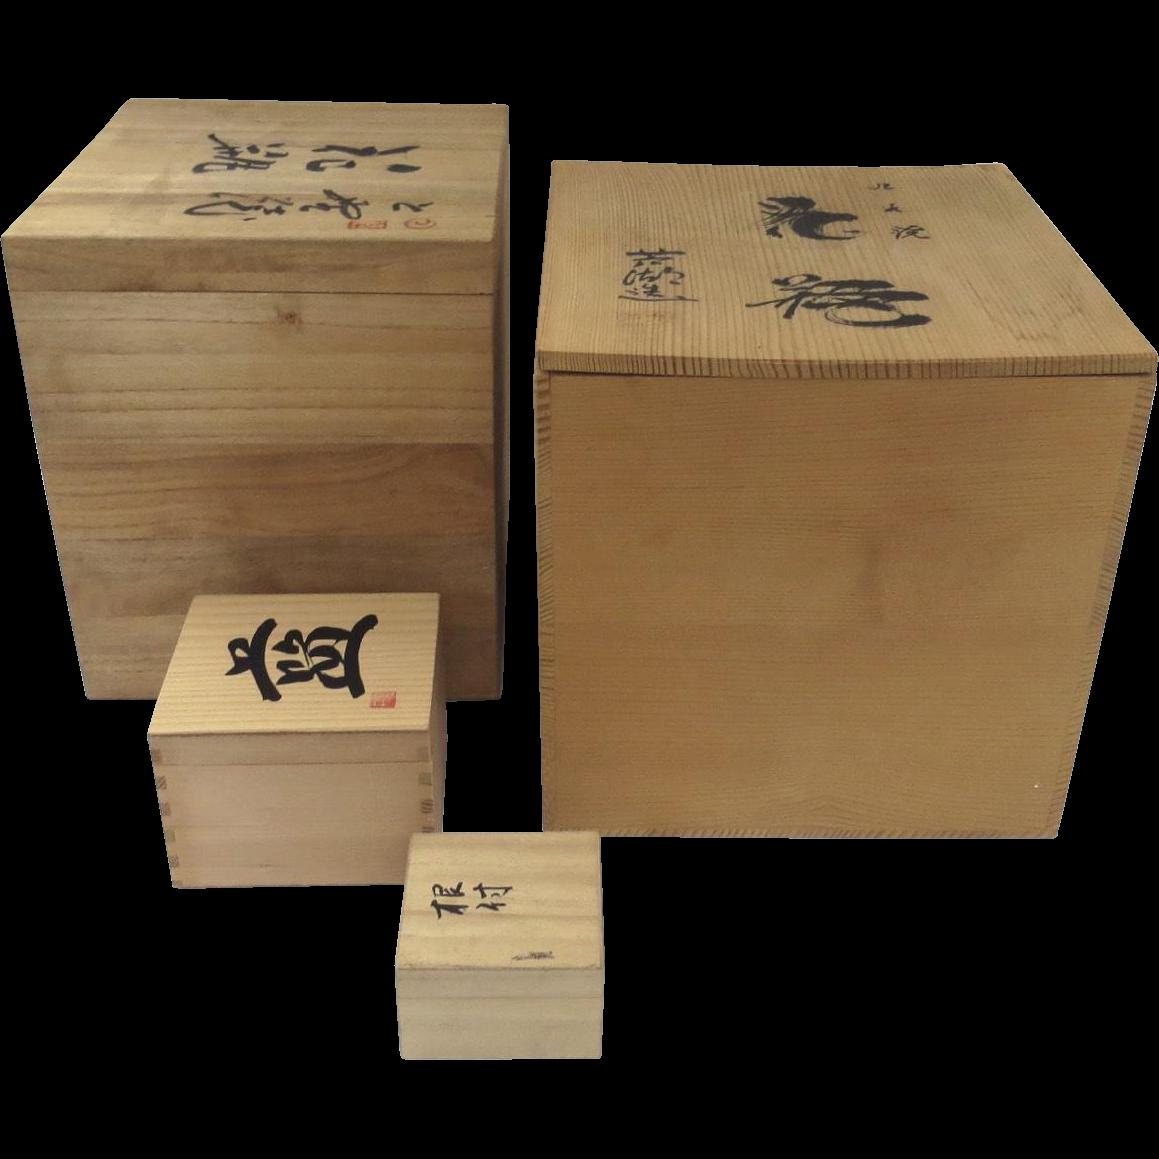 Vintage japanese vase wooden box